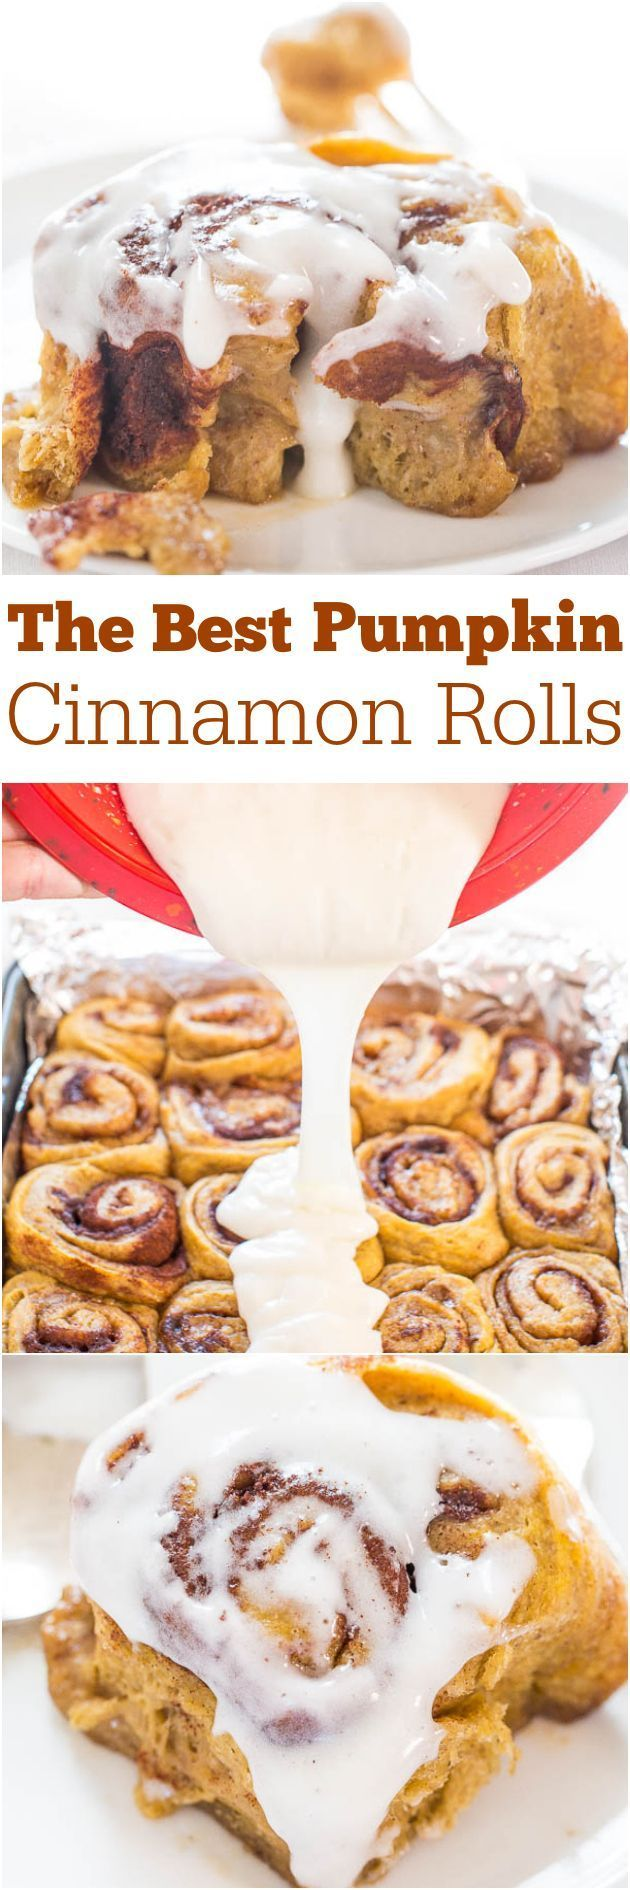 The Best Pumpkin Cinnamon Rolls